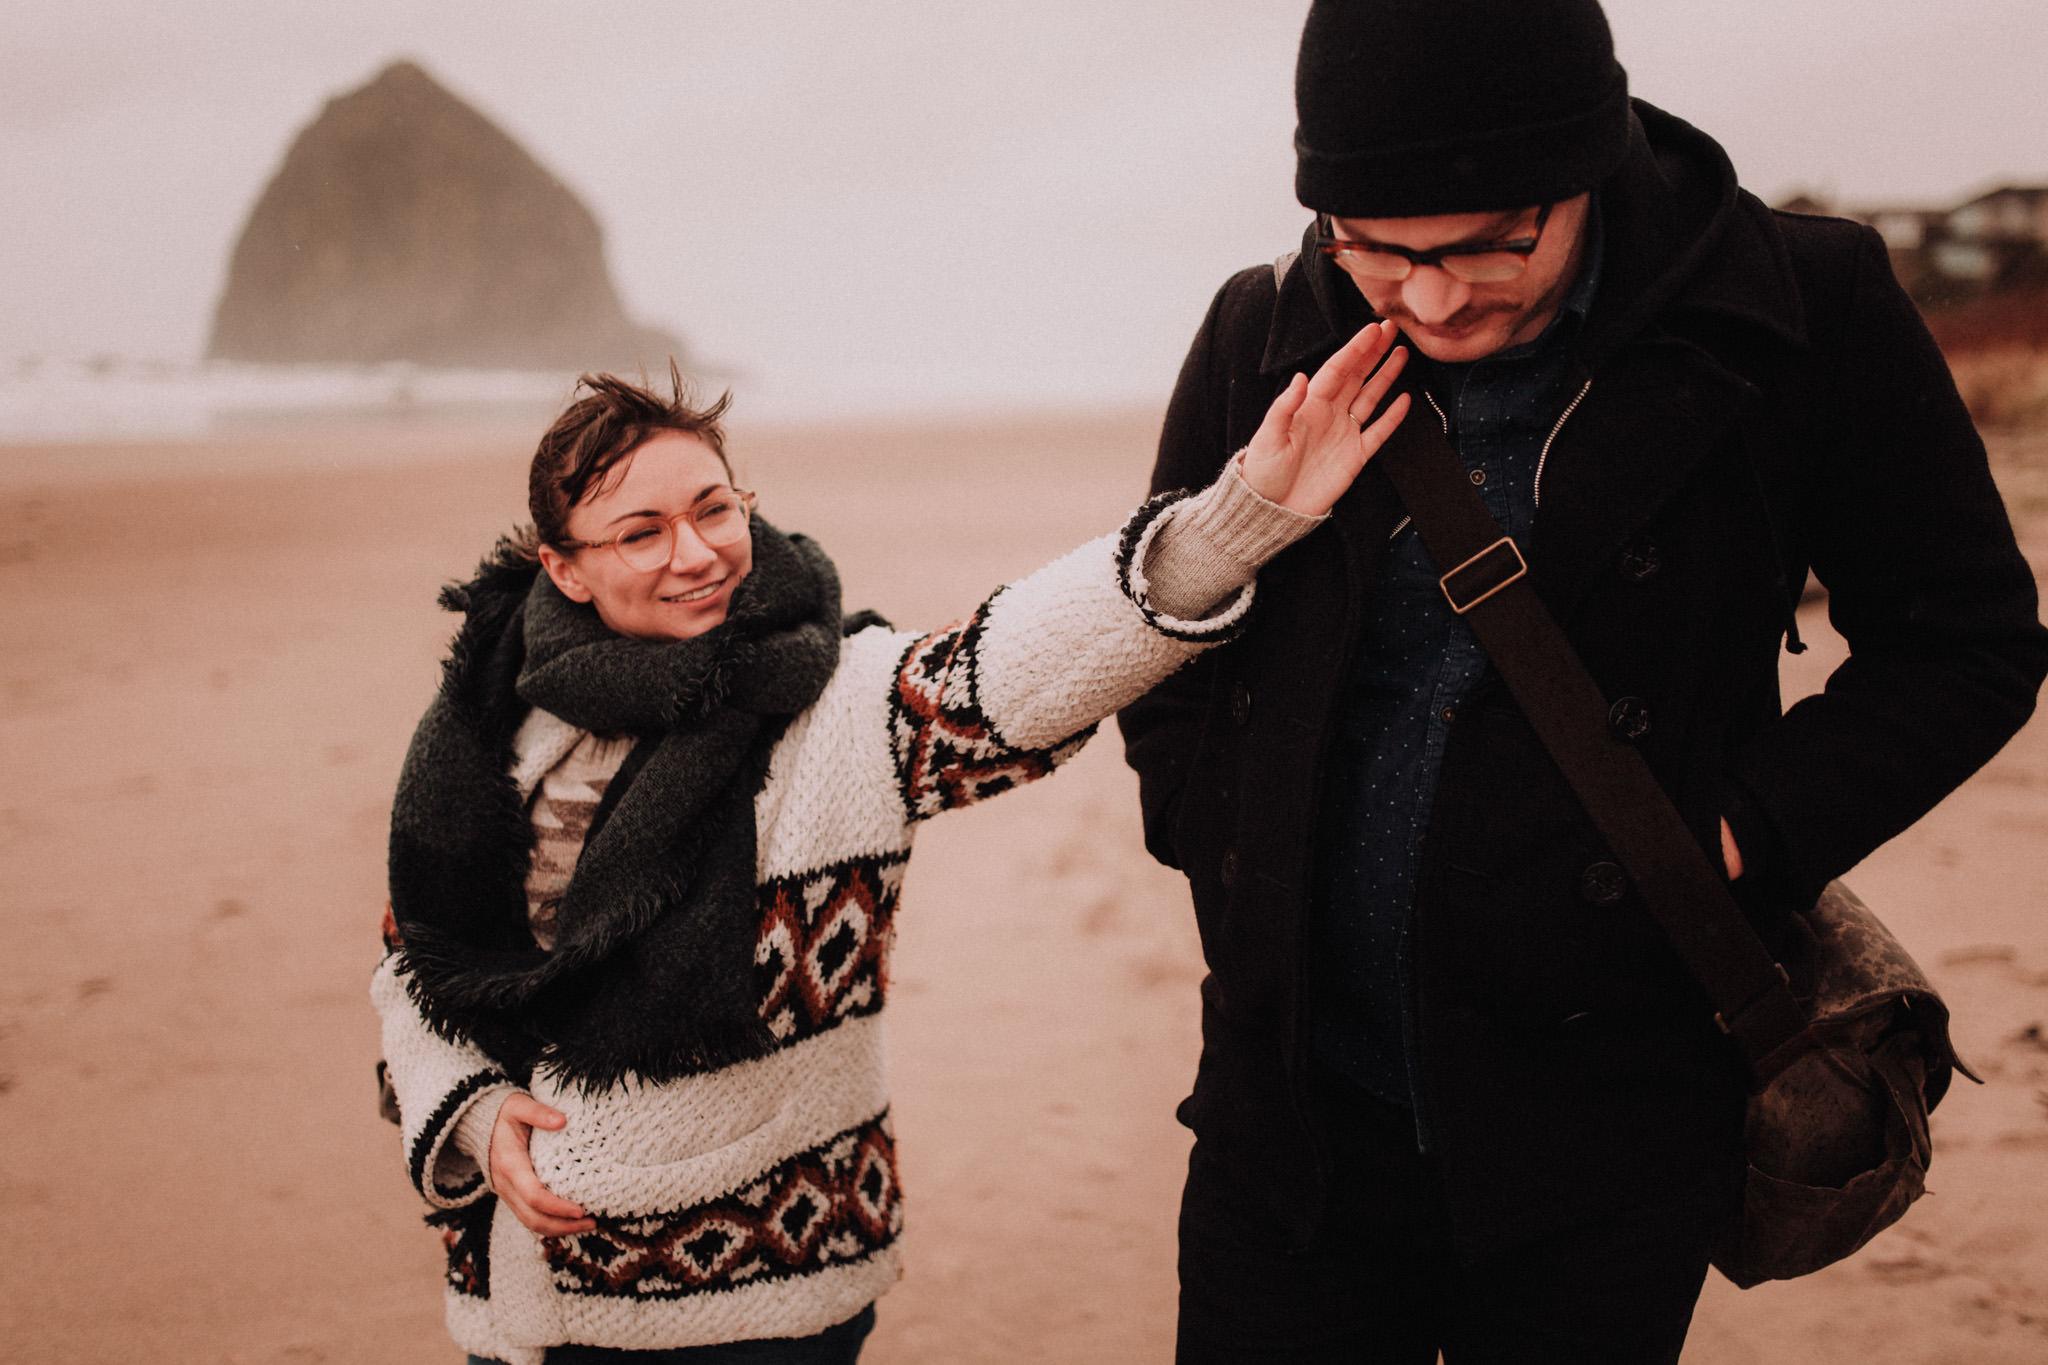 oregon-wedding-elopement-photographer-donmashelen-bringas47